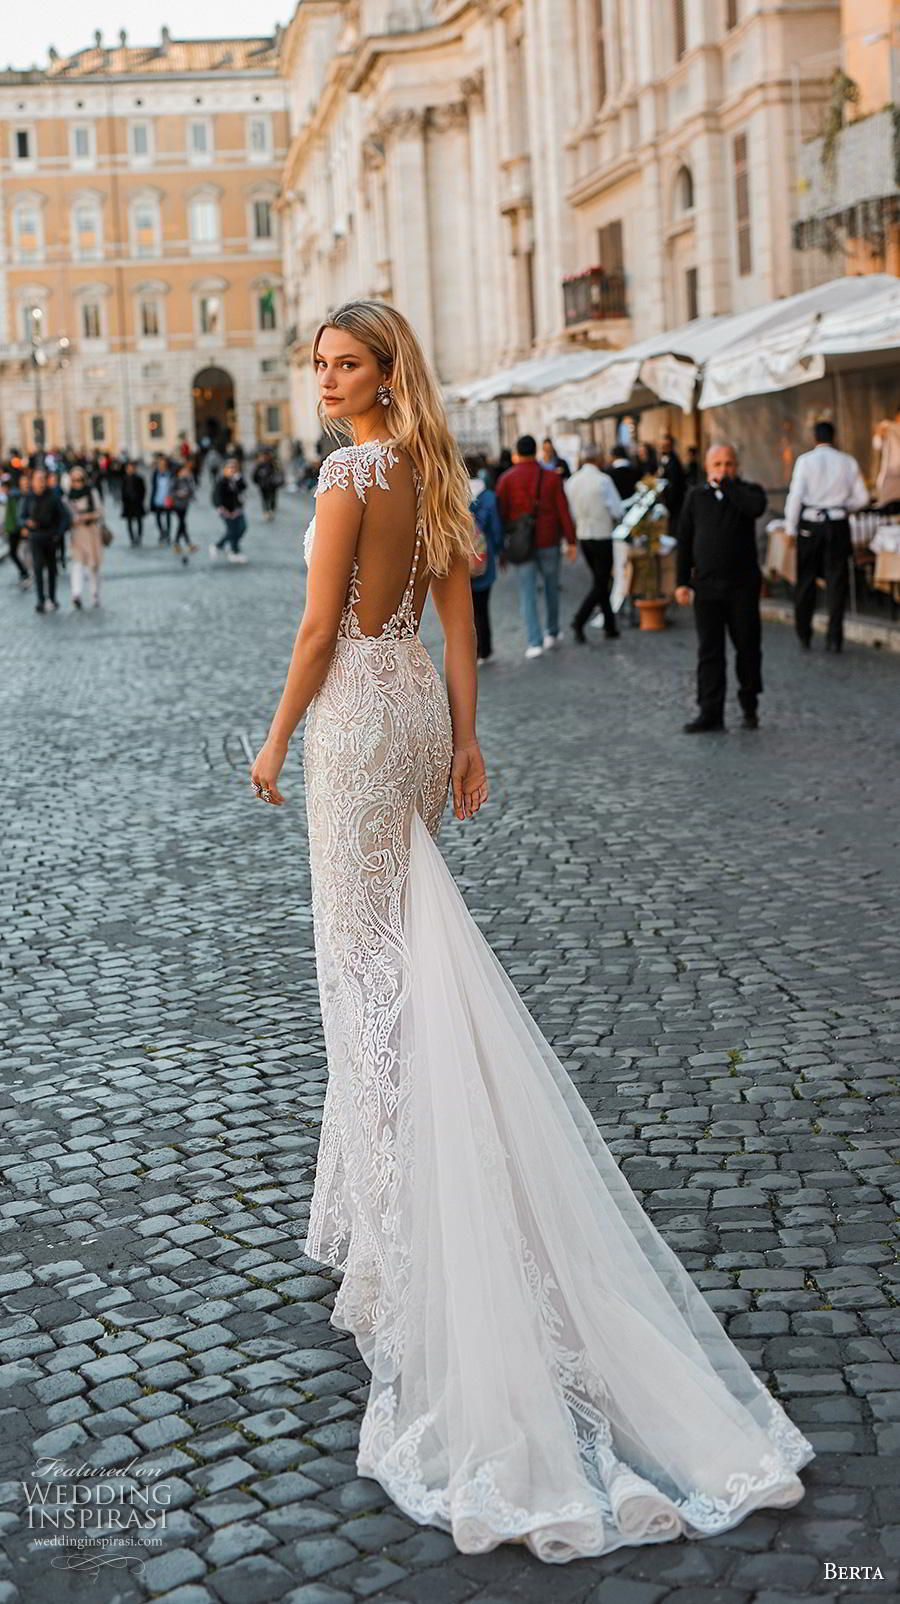 11fe9986e0bb Weddinginspirasi.com featuring - berta 2020 privee bridal cap sleeves  illusion bateau deep plunging sweetheart